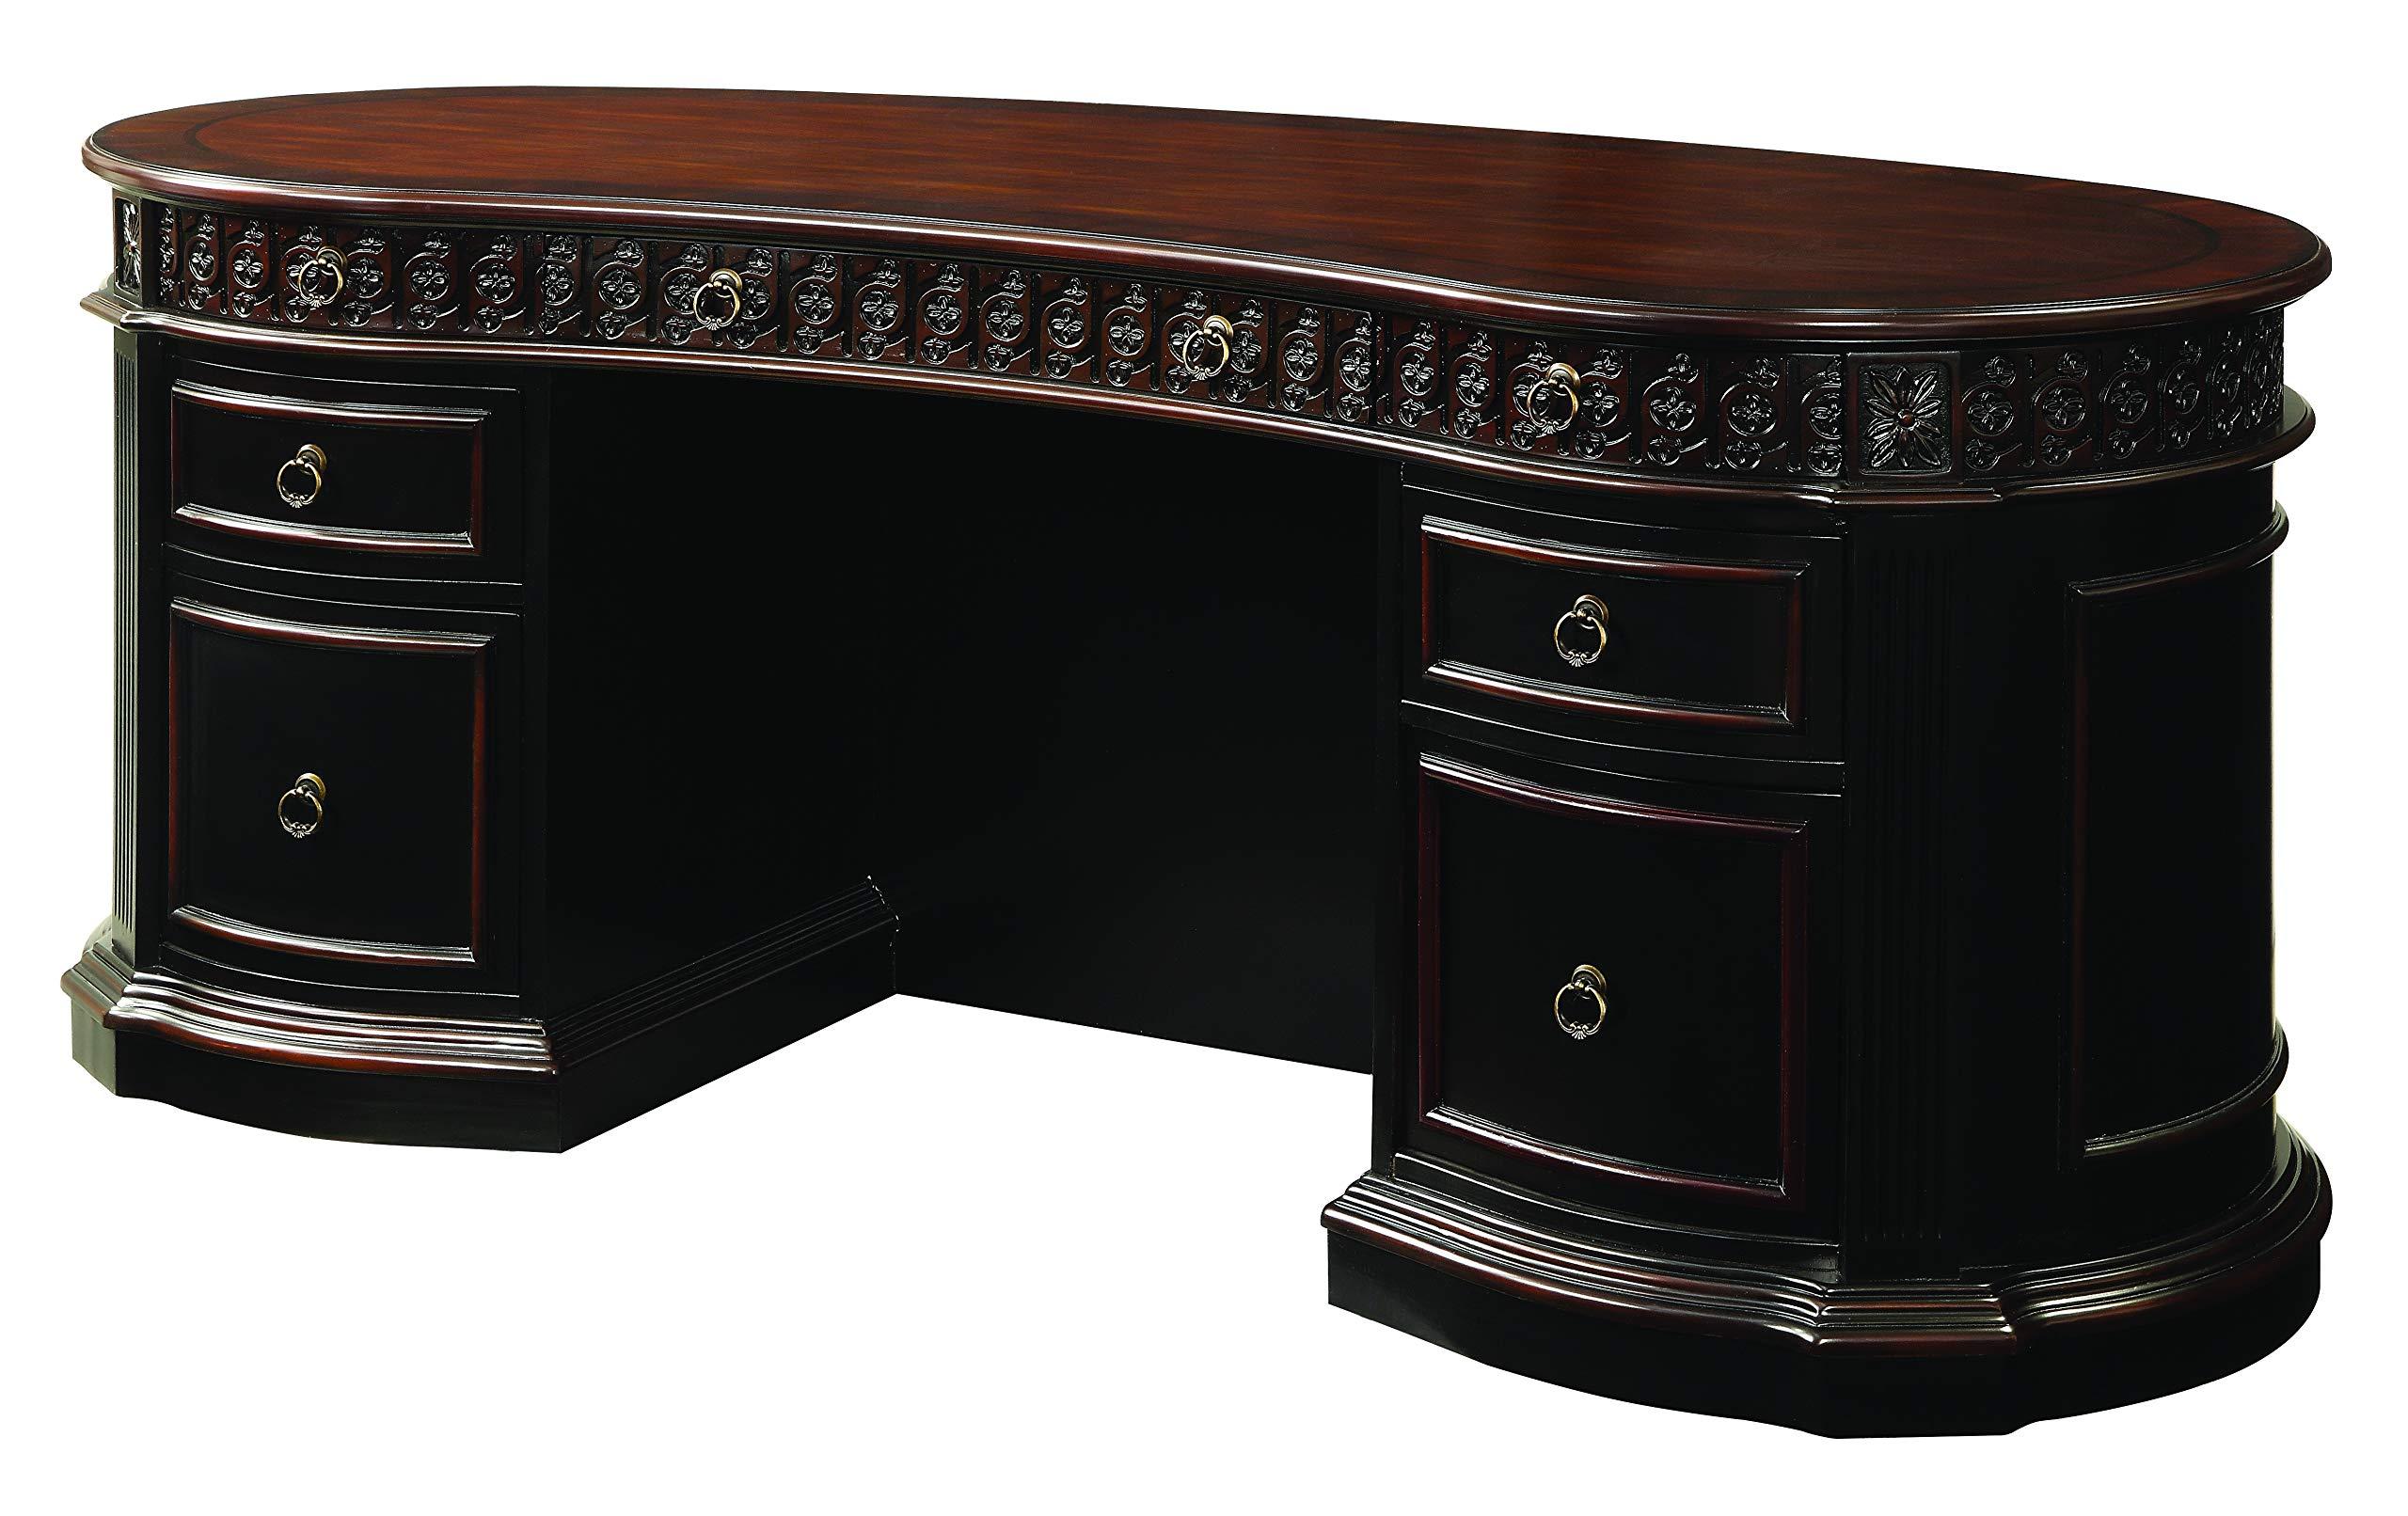 Rowan Oval Double Pedestal Executive Desk Black and Chesnut by Coaster Home Furnishings